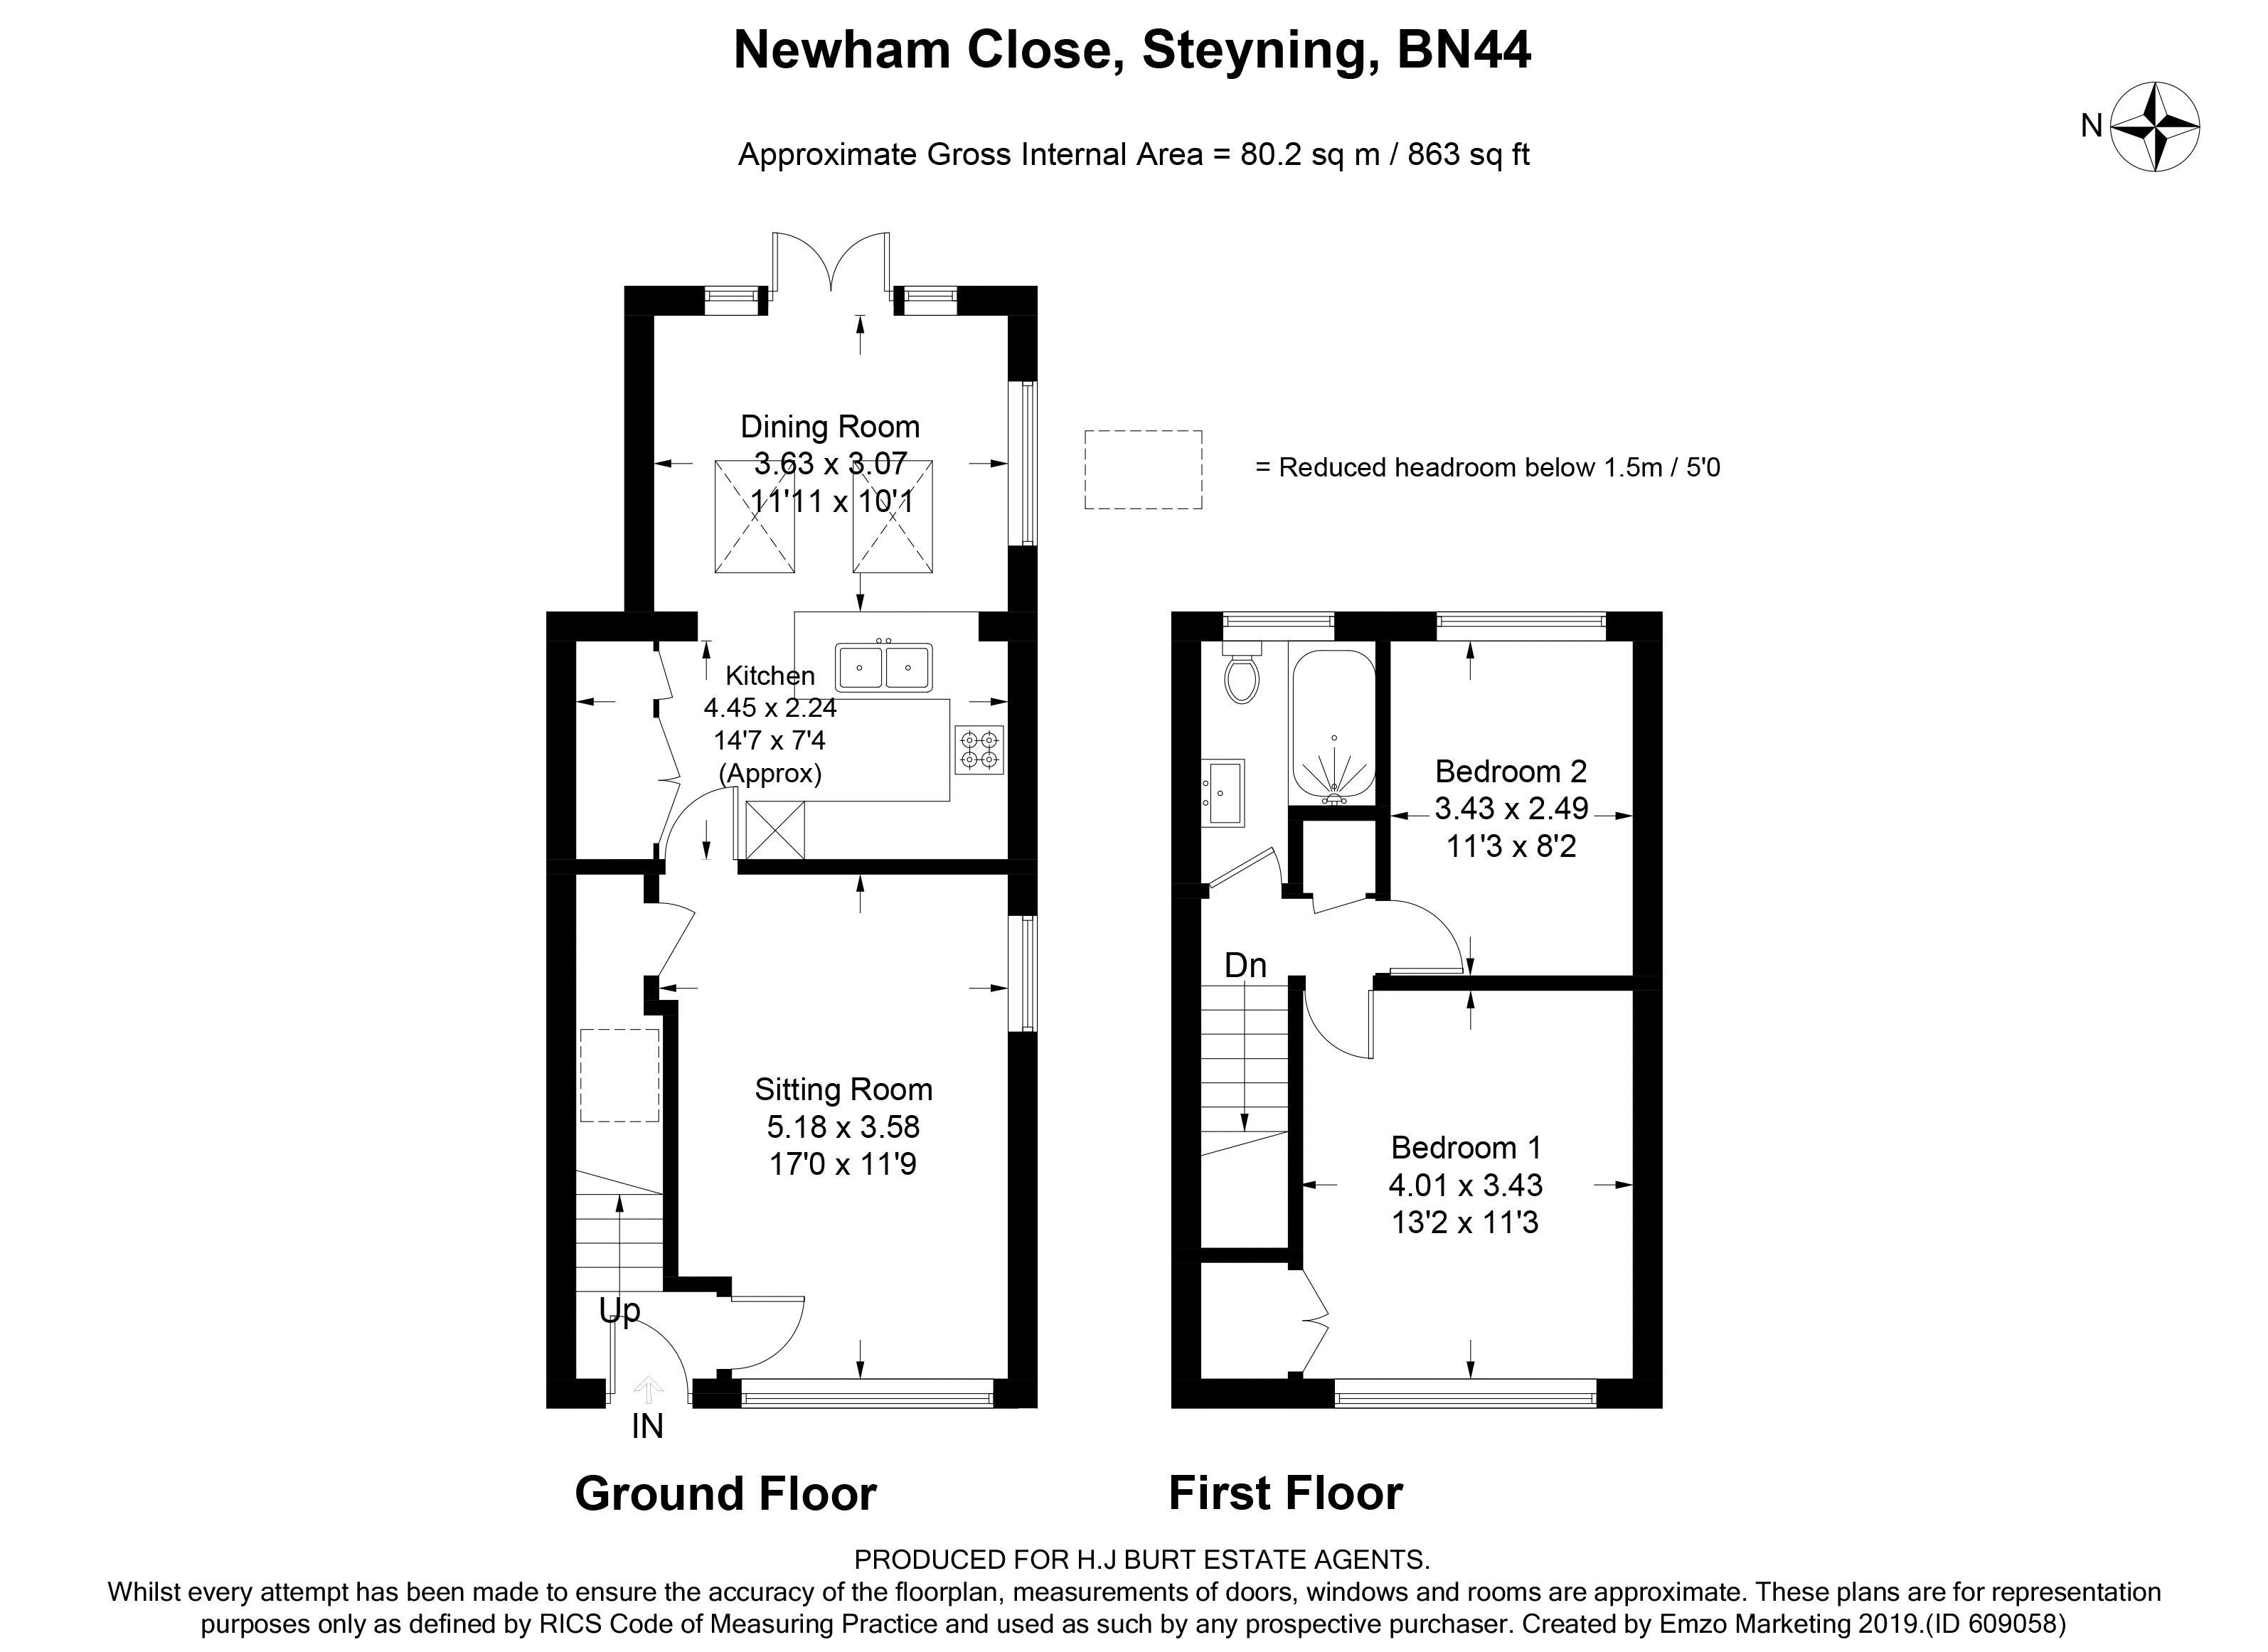 Newham Close